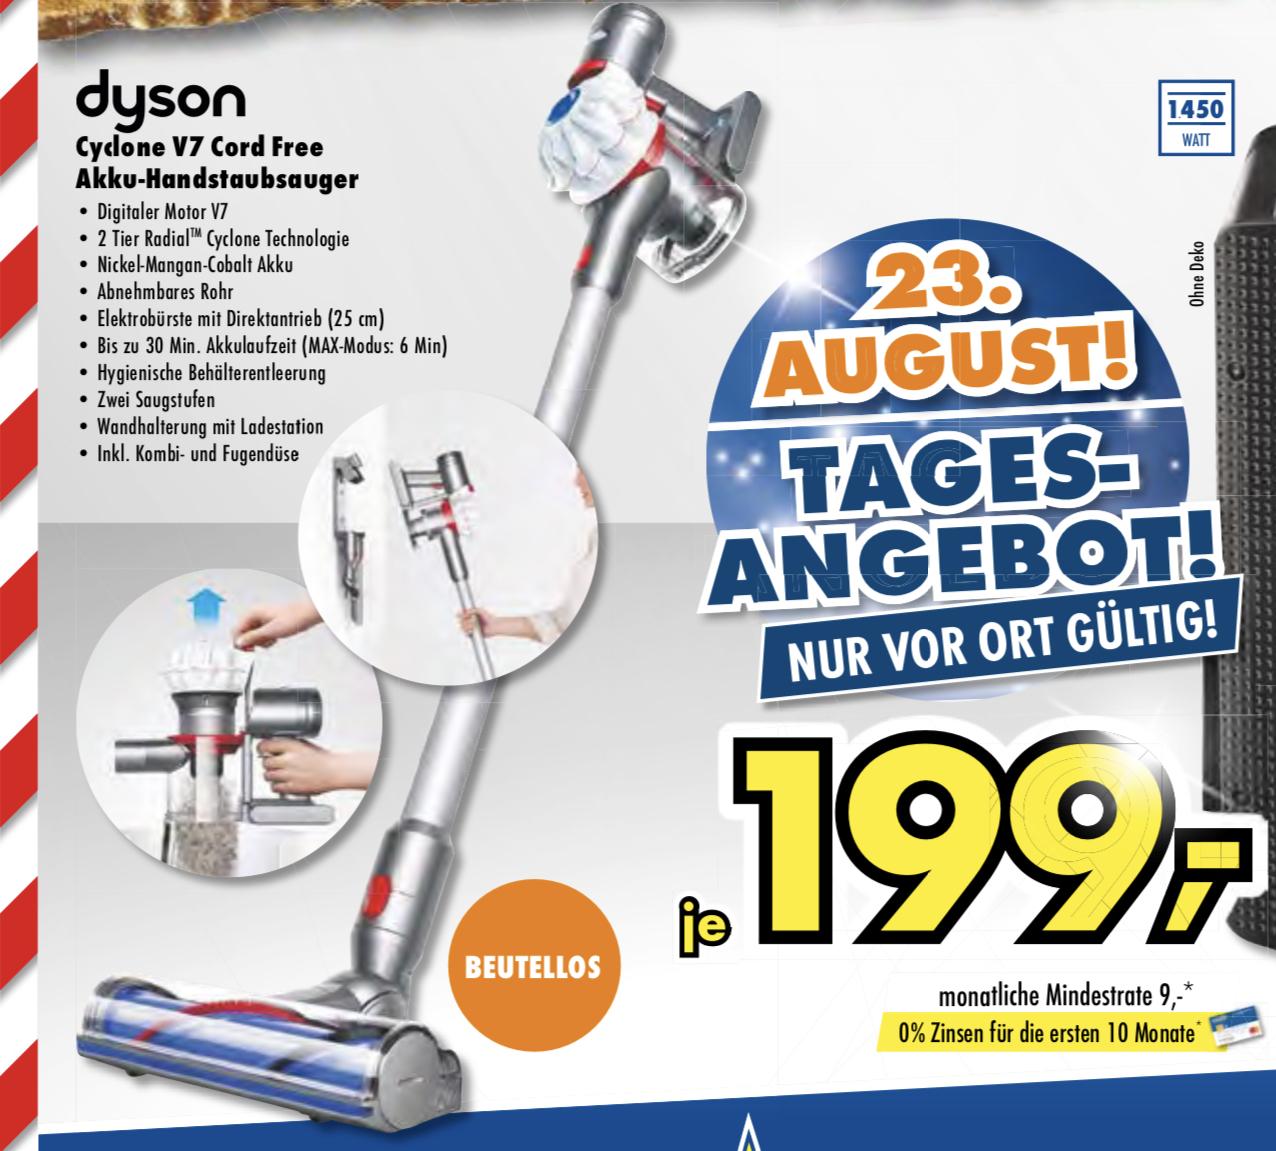 Lokal Euronics Mega Company: Dyson V7 Cord Free für 199€ oder Krups EA 8160 mit Auto-Cappucino-System für 199€ - NUR heute!